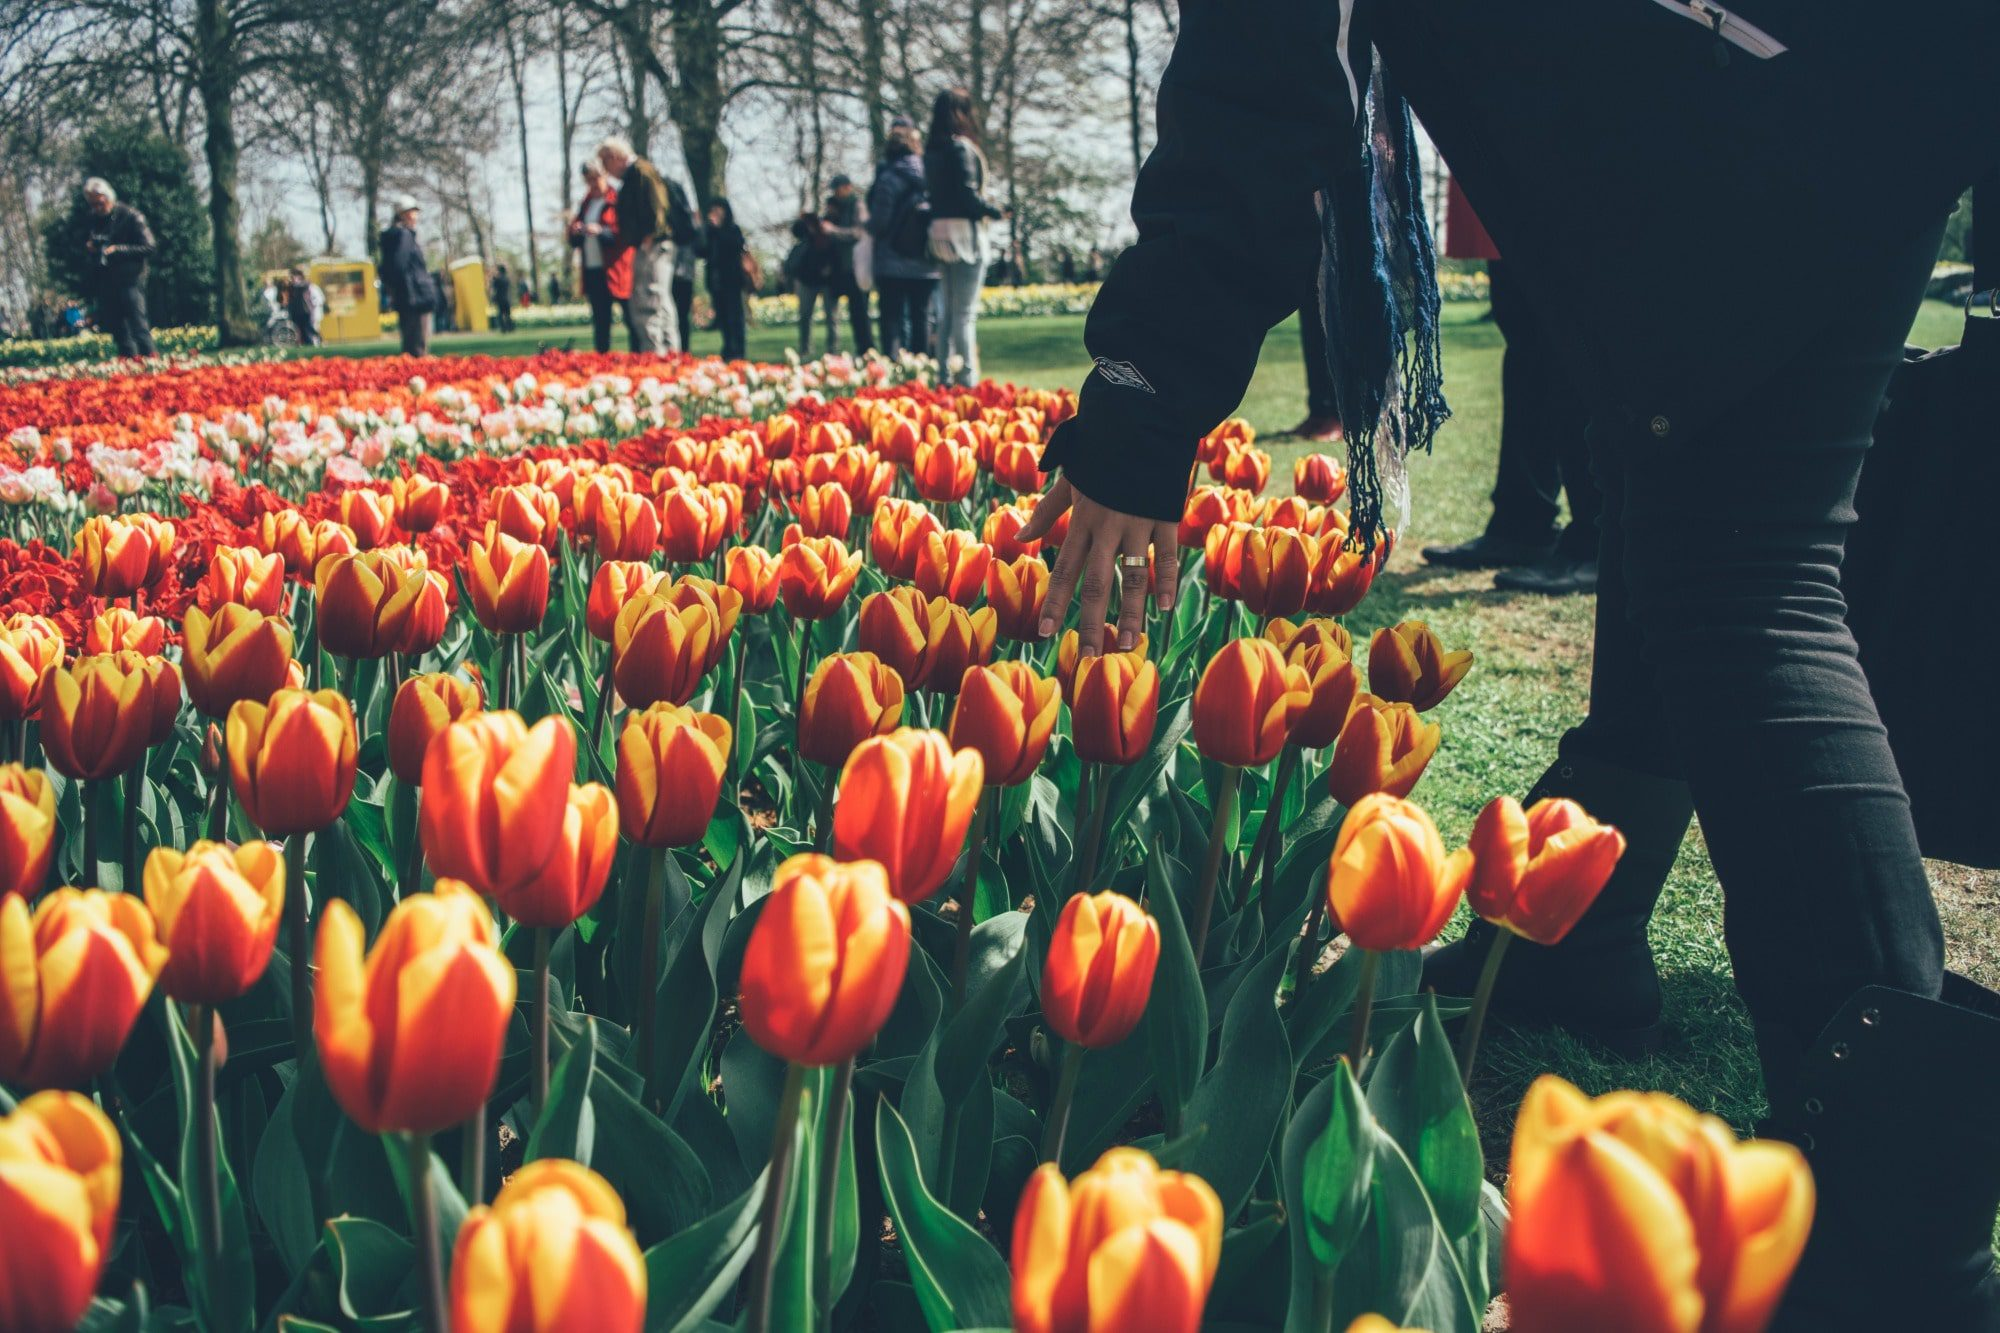 amsterdam-tulips-park-min